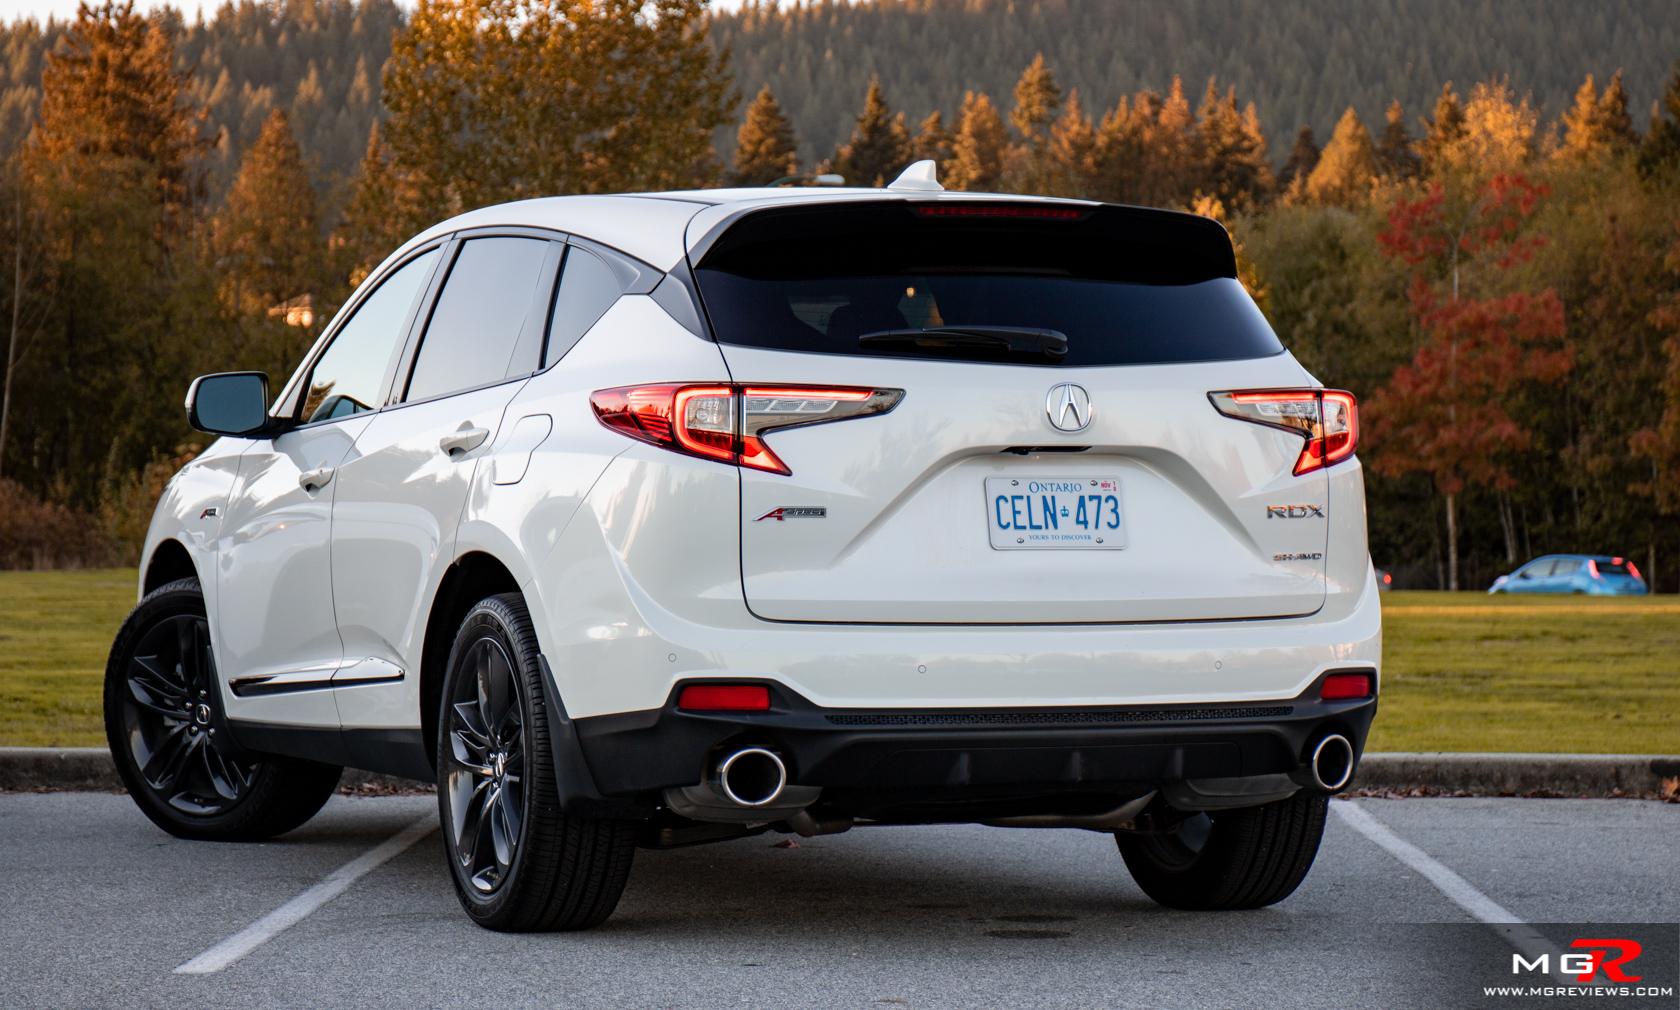 Comparison: 2019 Acura RDX vs 2019 Infiniti QX50 - M.G.Reviews